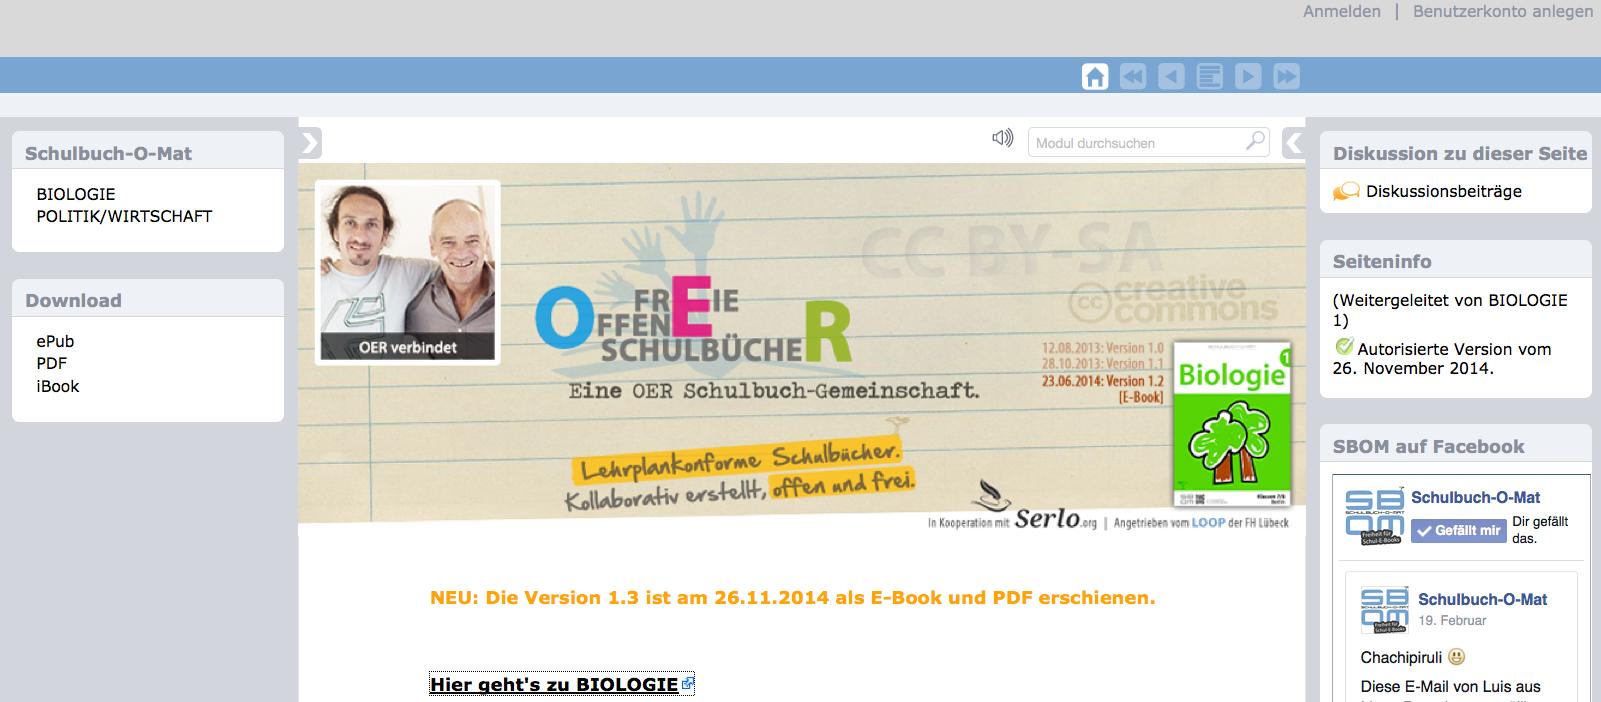 Screenshot von schulbuch-o-mat.oncampus.de (nicht unter freier Lizenz)